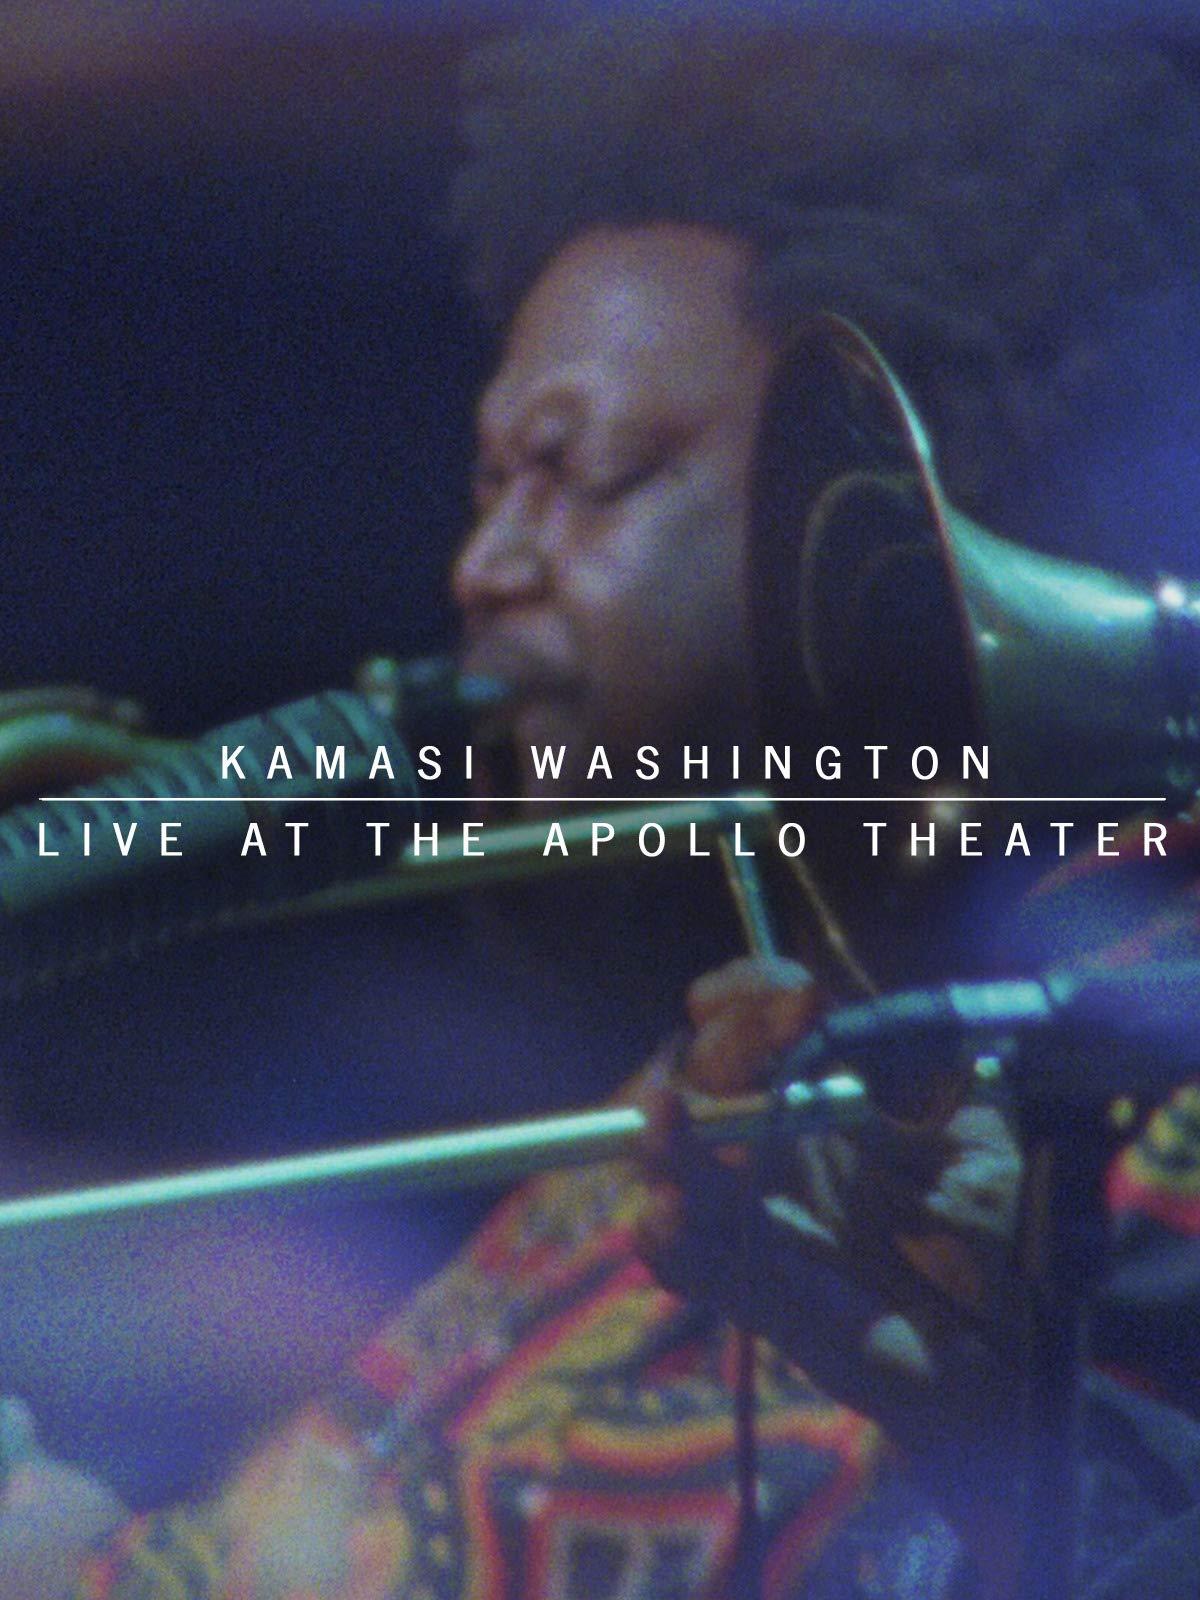 Kamasi Washington Live At The Apollo Theater